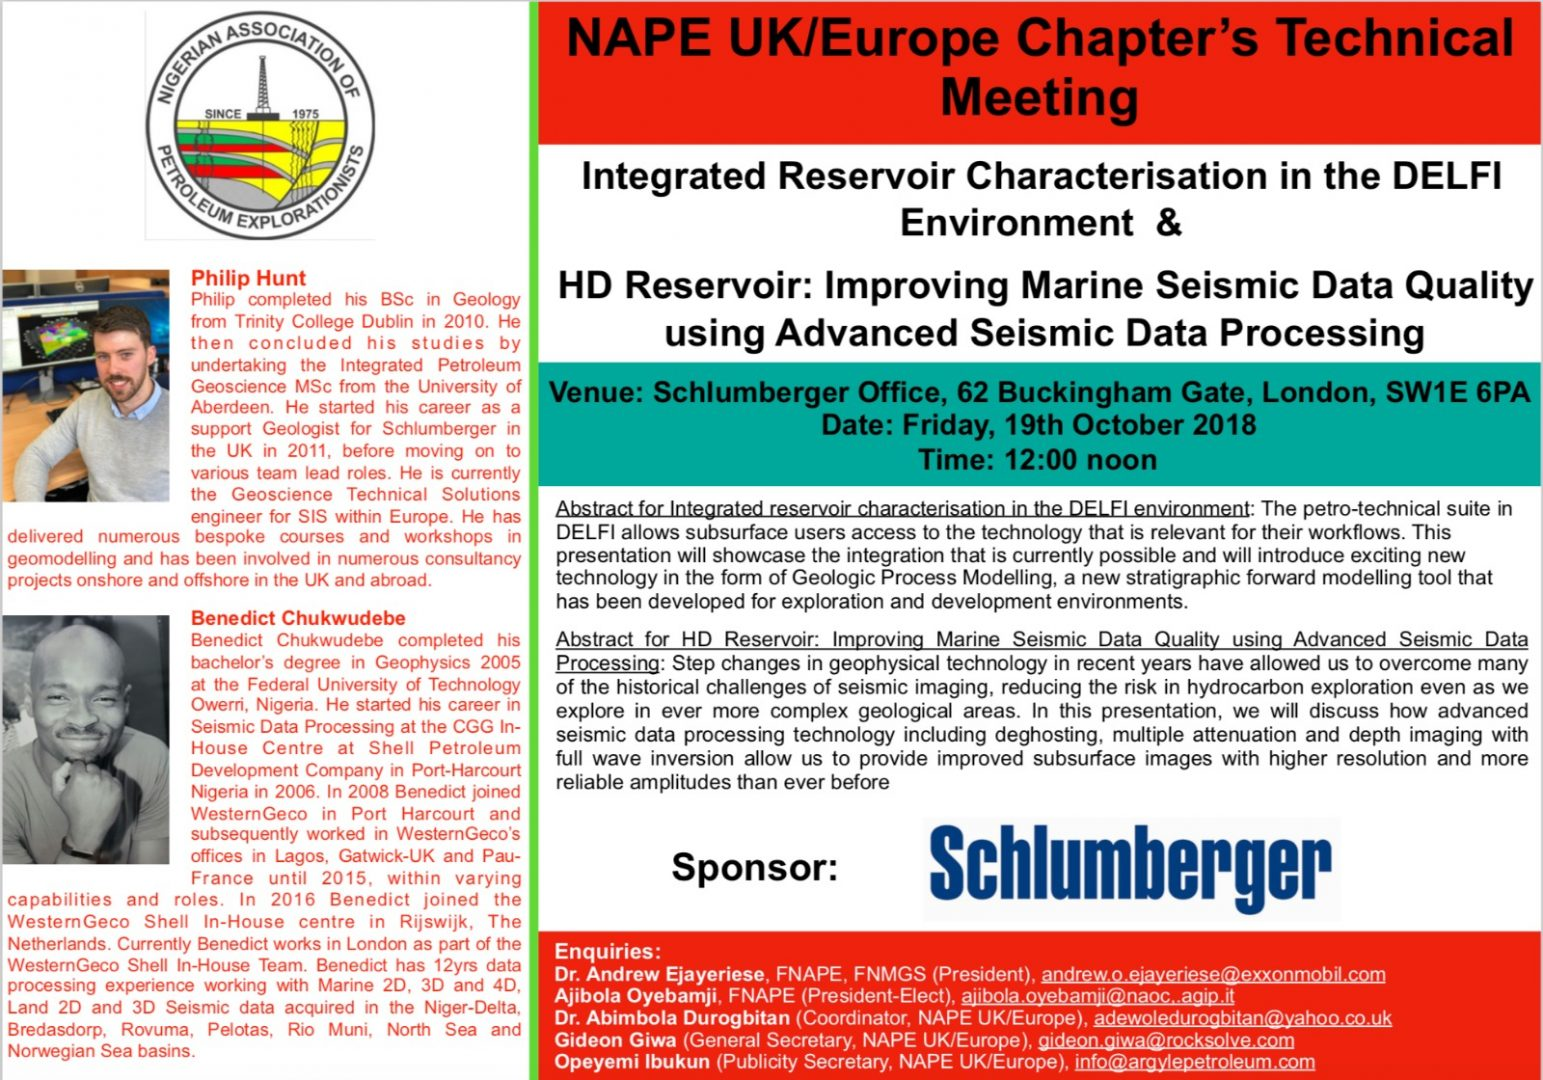 NAPE UKEurope TMOct19